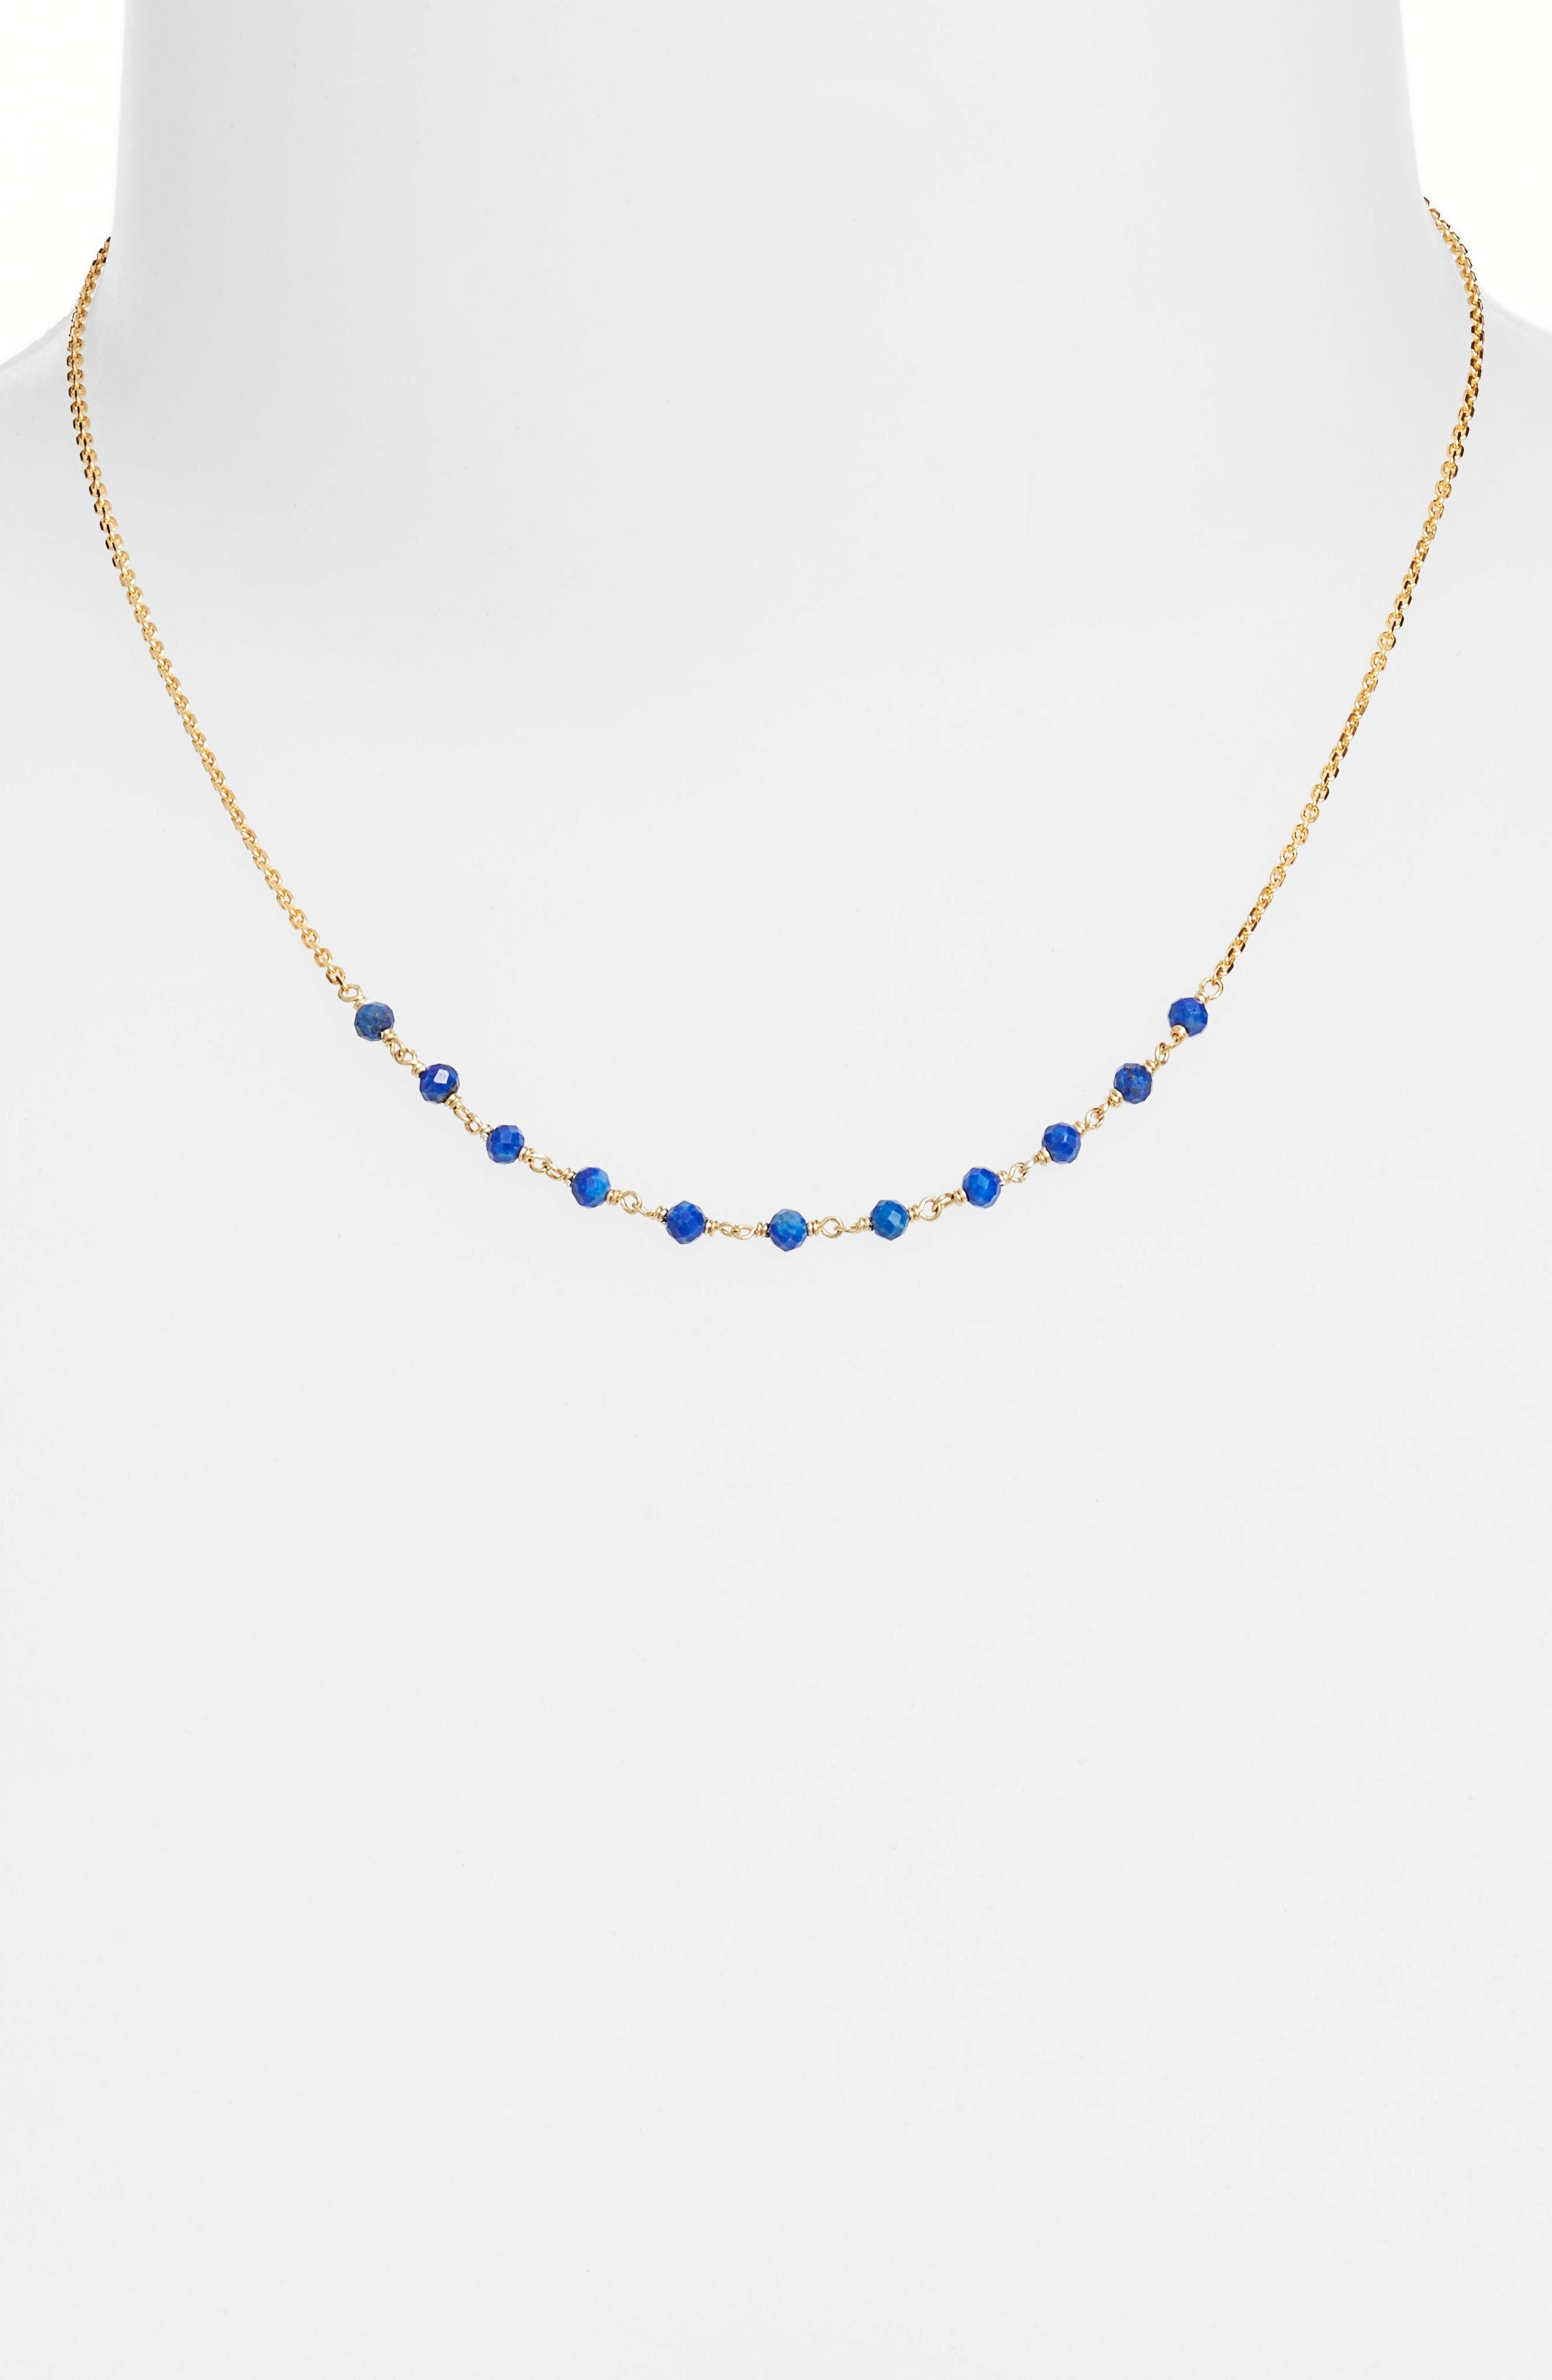 Gold & Bead Necklace,                         Main,                         color, Gold/ Lapis